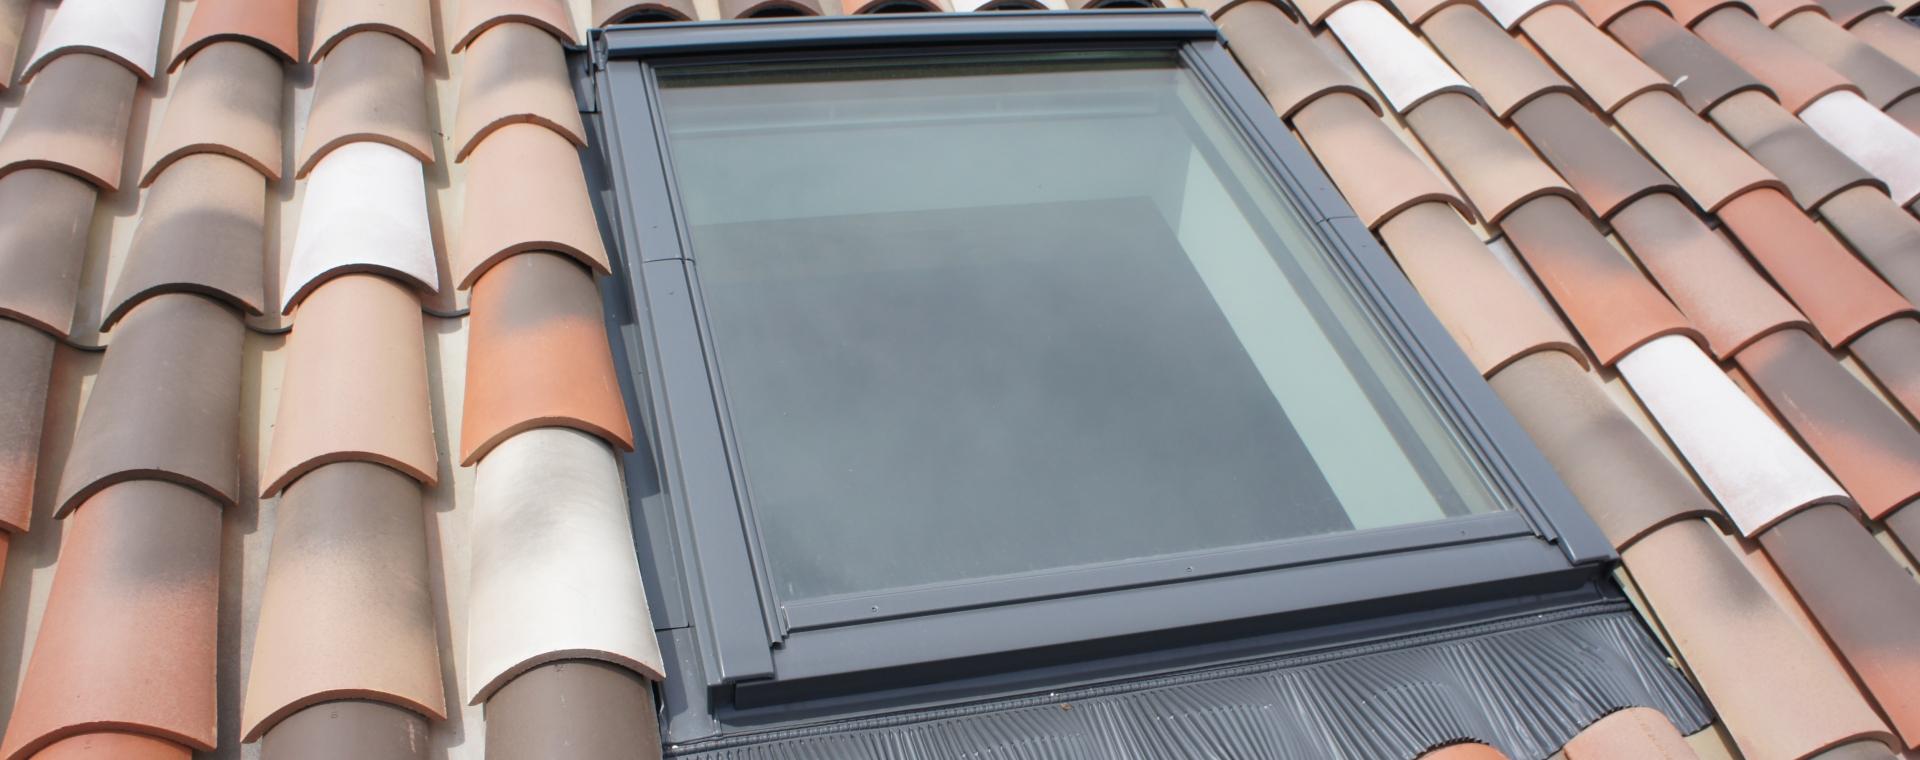 installation de fen tre de toit velux aubenas ard che. Black Bedroom Furniture Sets. Home Design Ideas